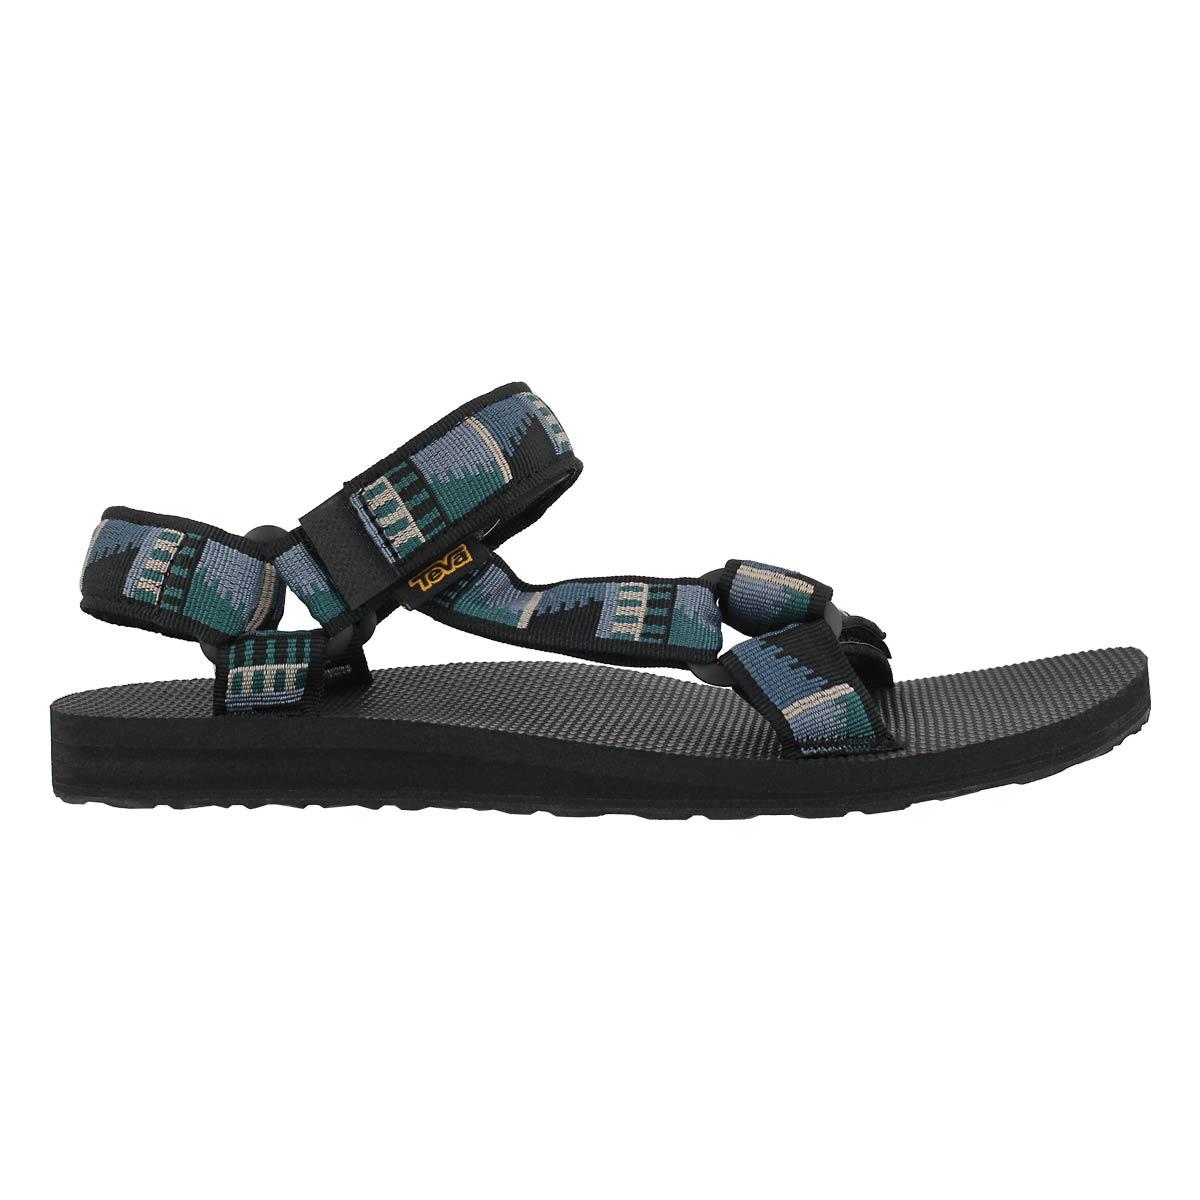 Sandales ORIGINAL UNIVERSAL, bleu, hommes